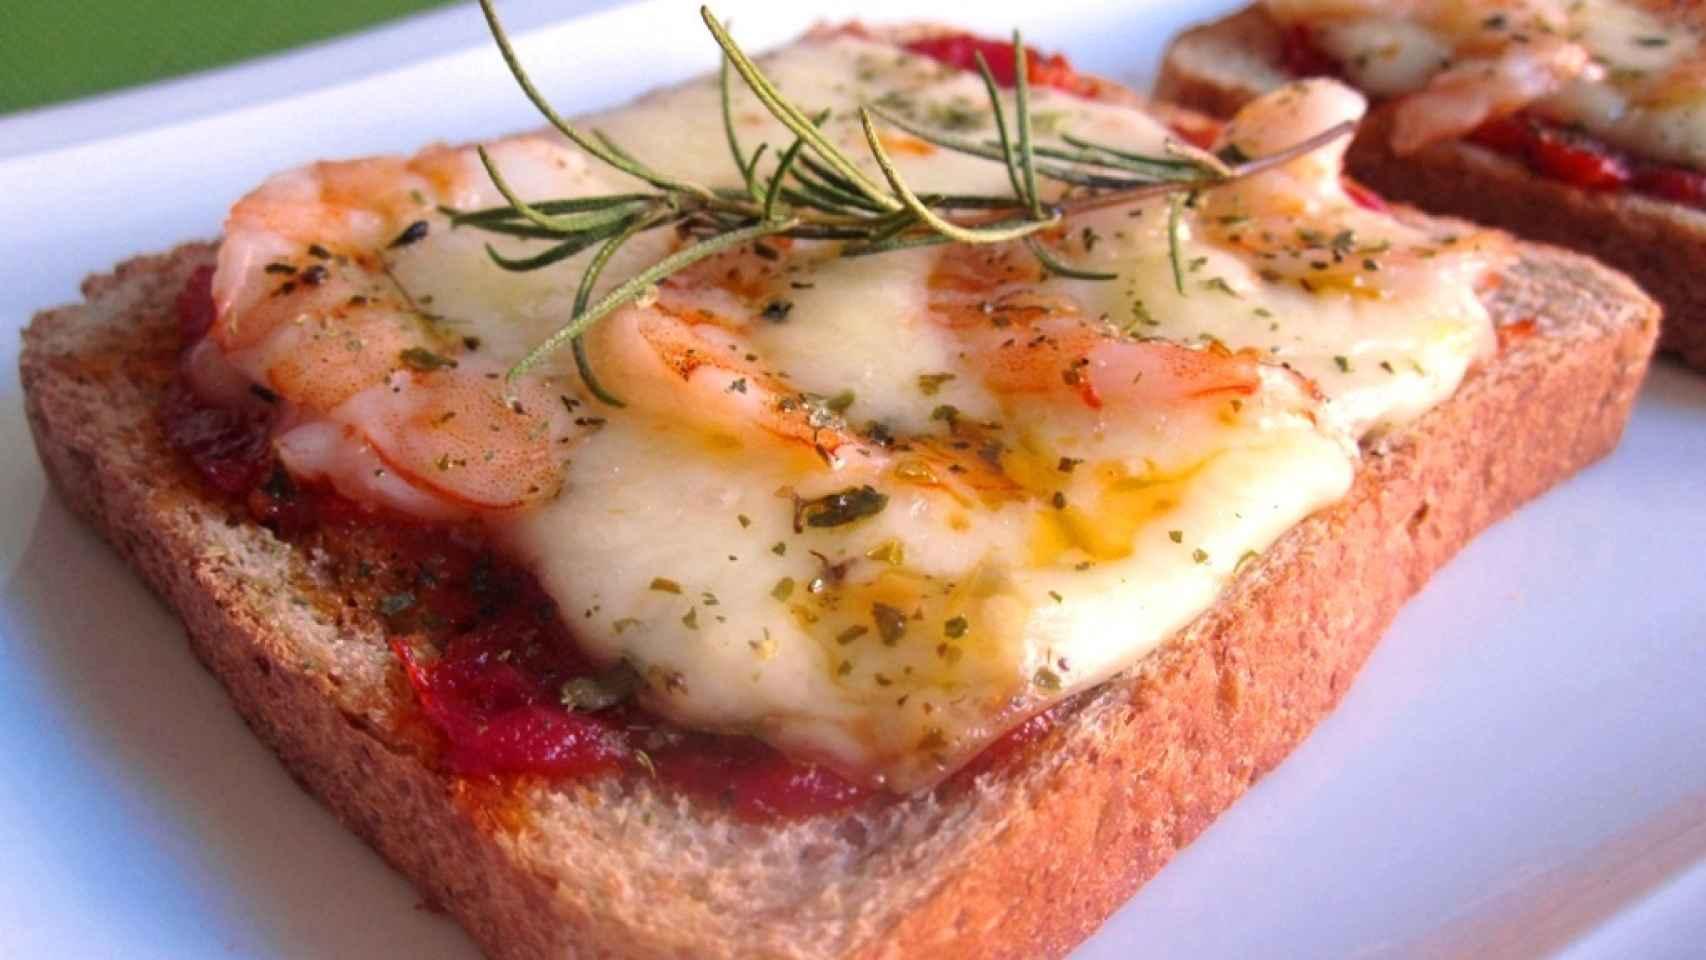 Pizza con pan de molde y salsa de tomate express